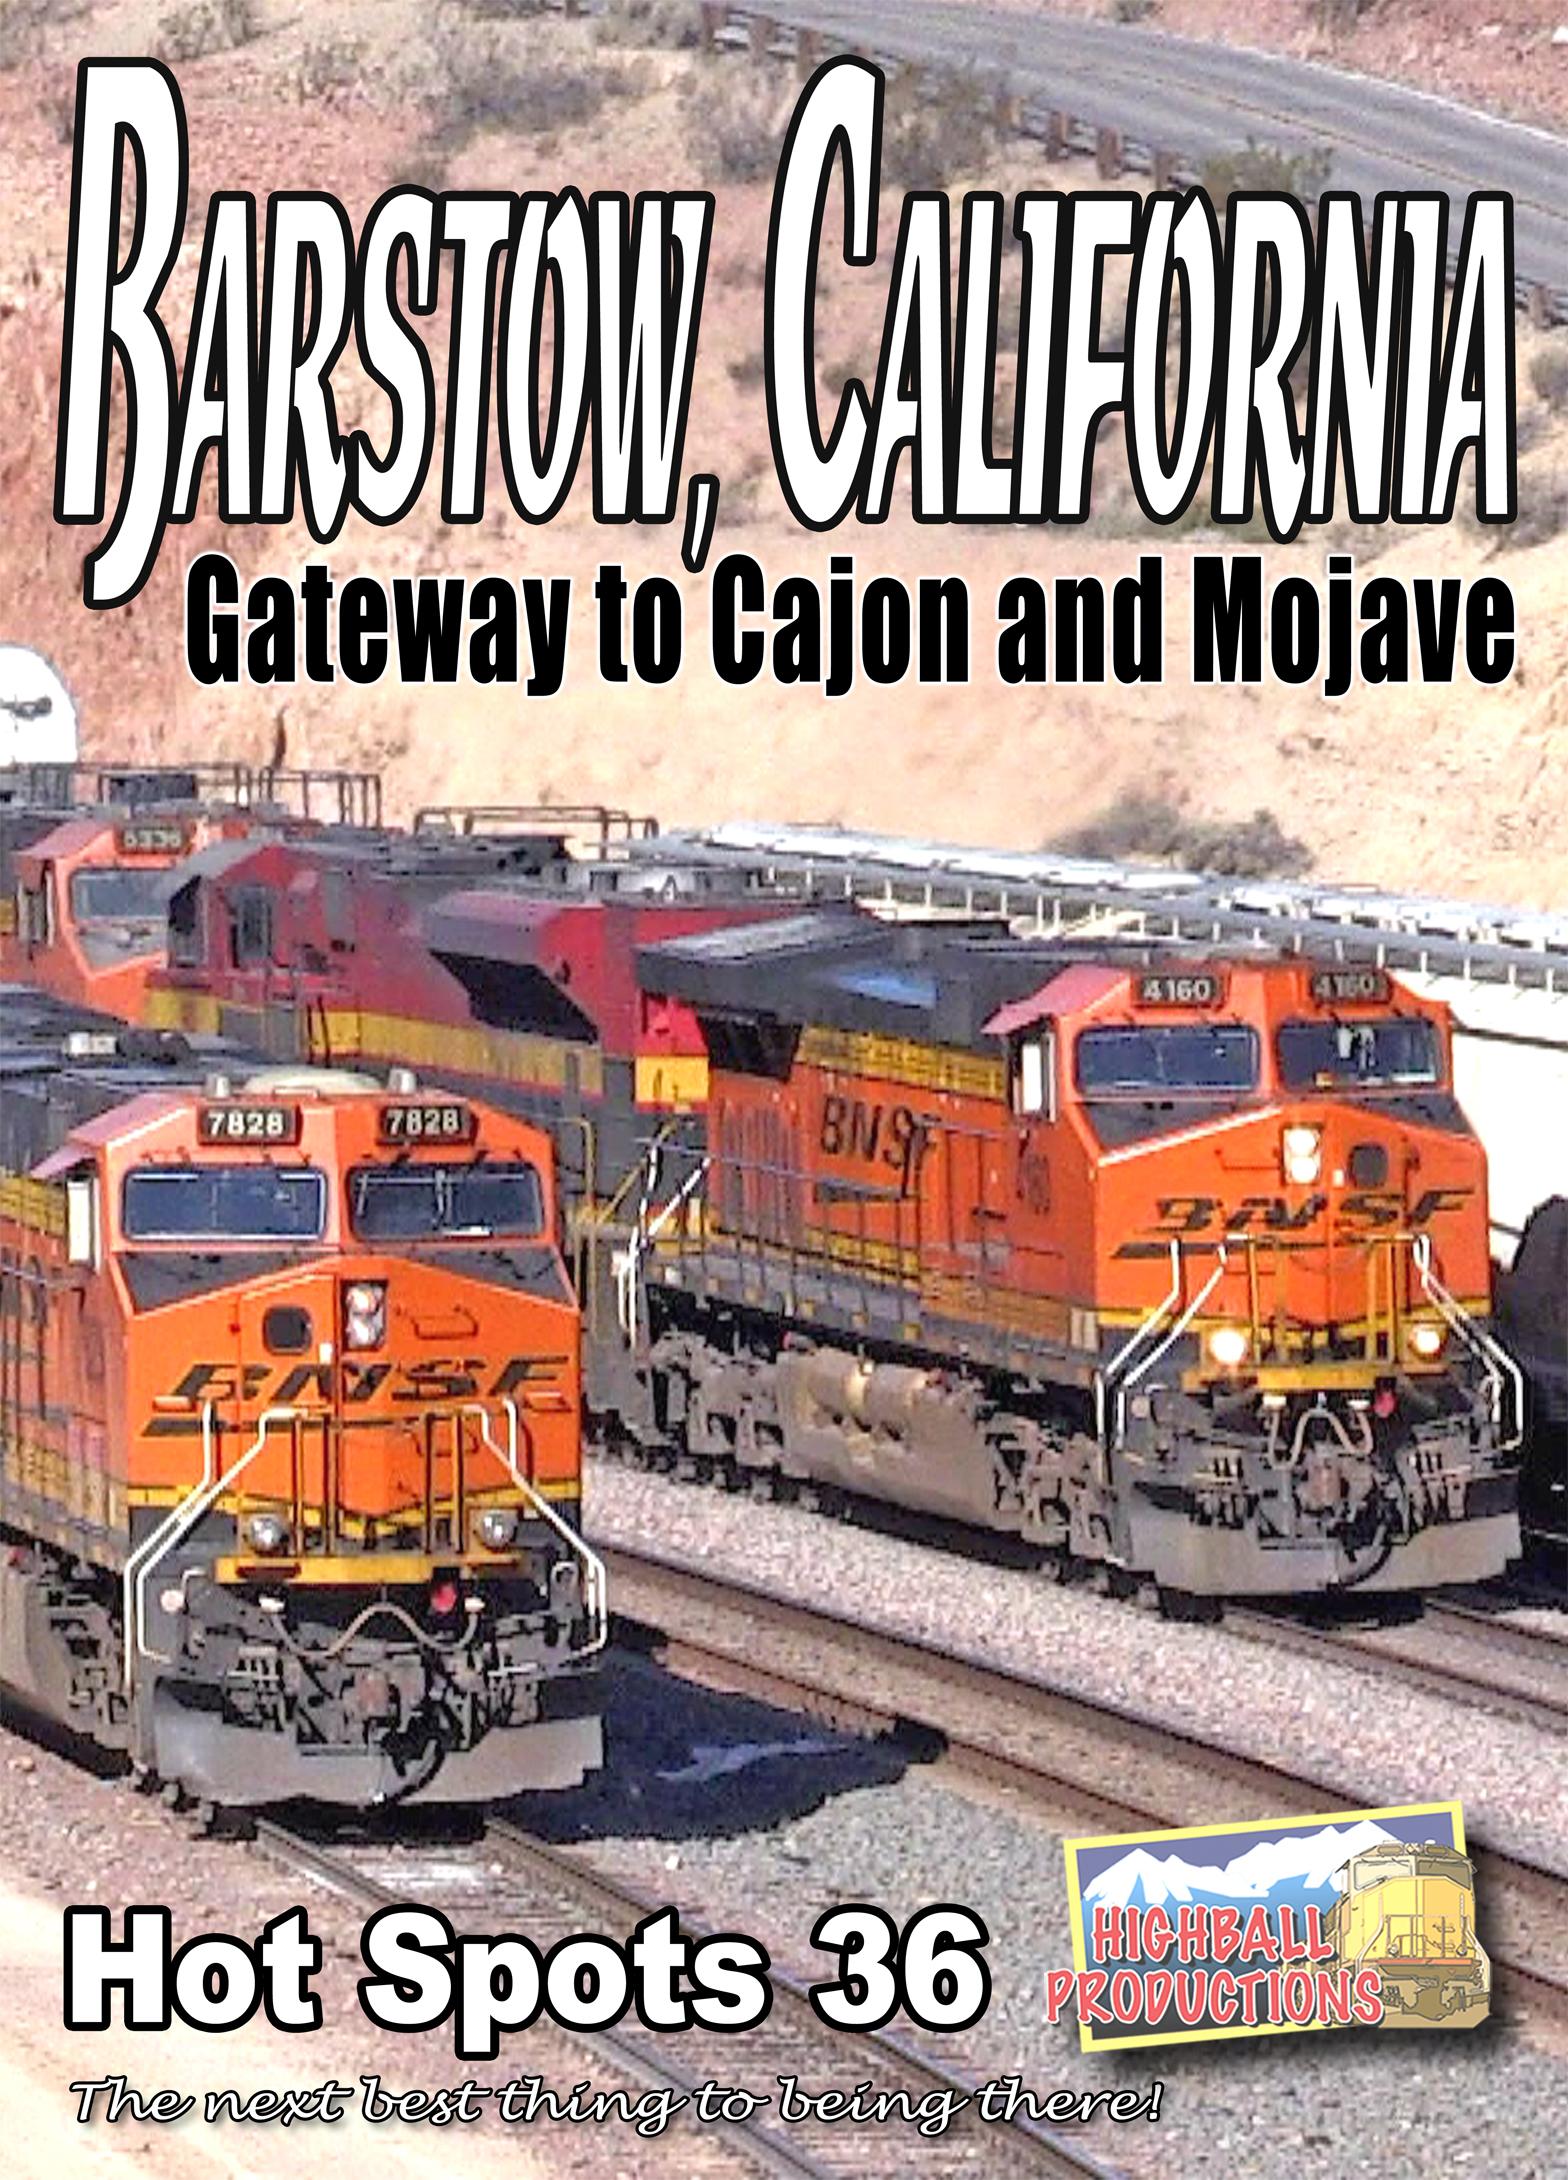 Hot Spots 36 Barstow California DVD Highball Productions HOT36 634972955350